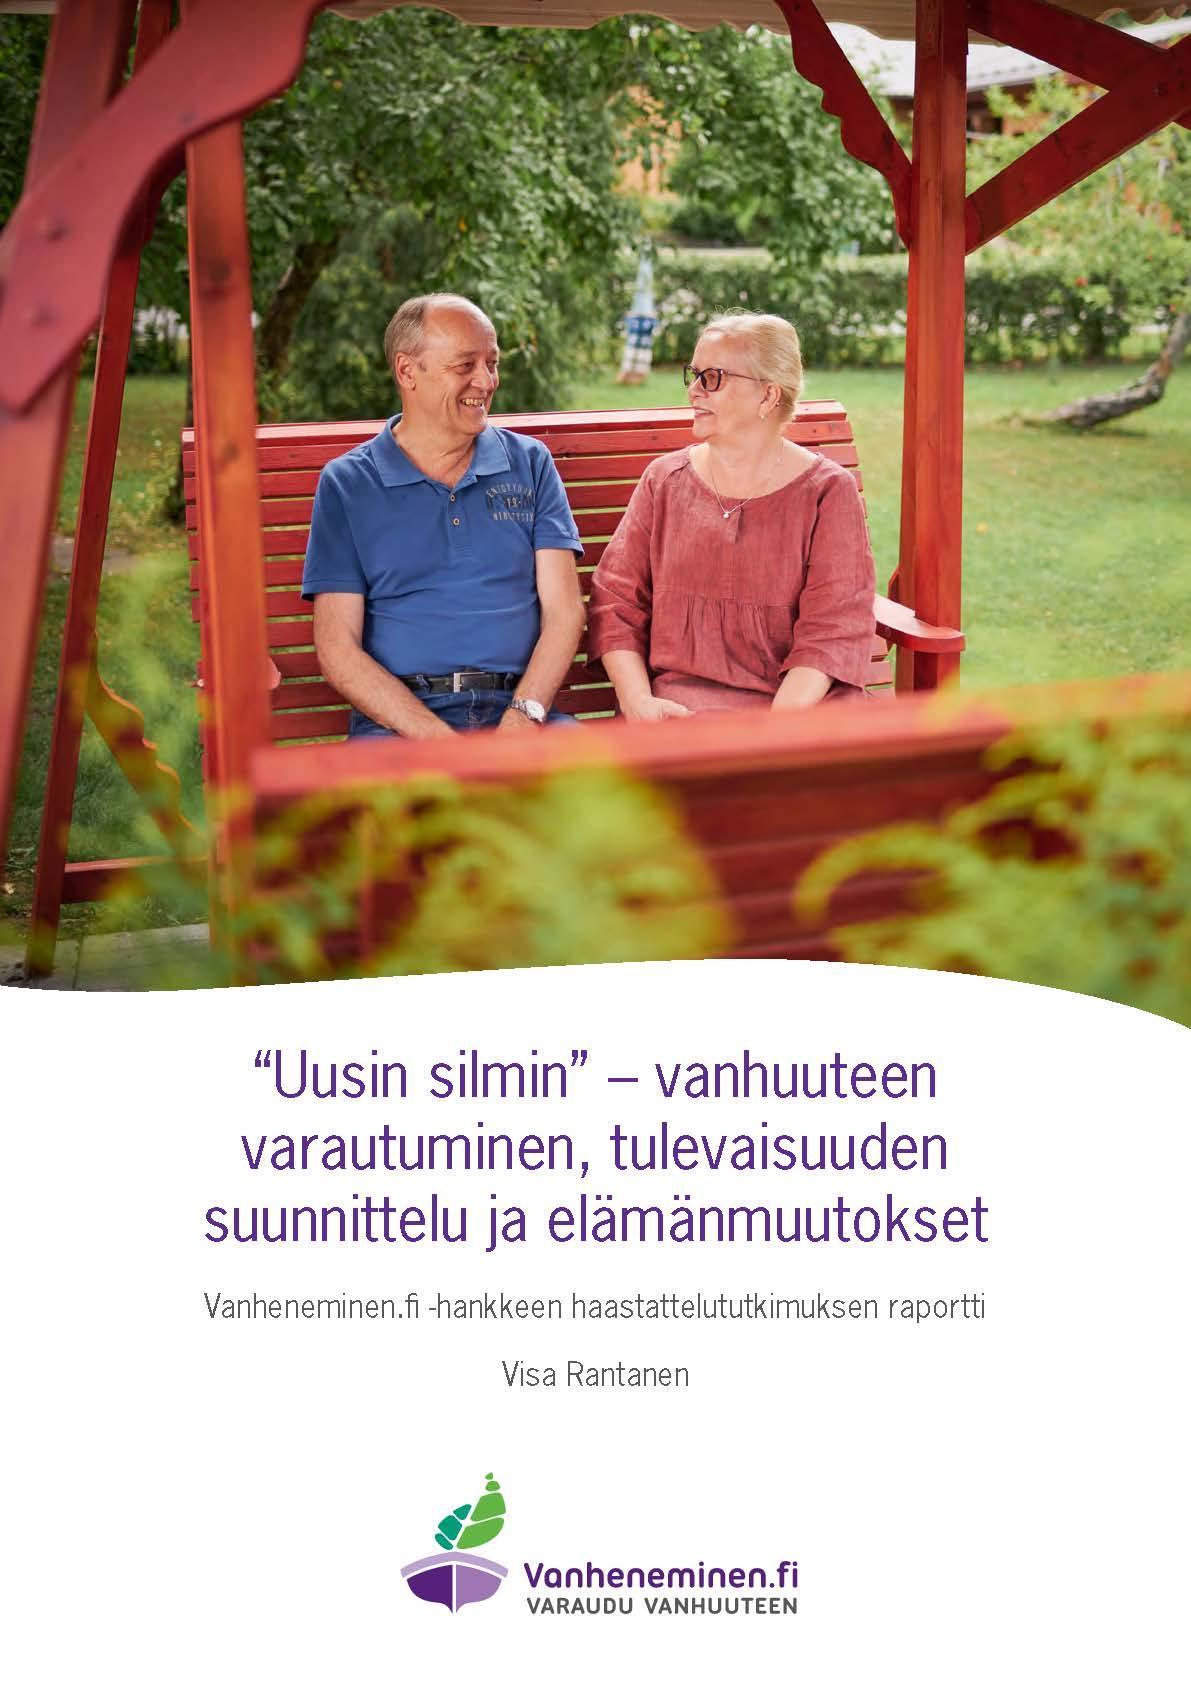 Tutkimusraportti 2021 Vanheneminen.fi